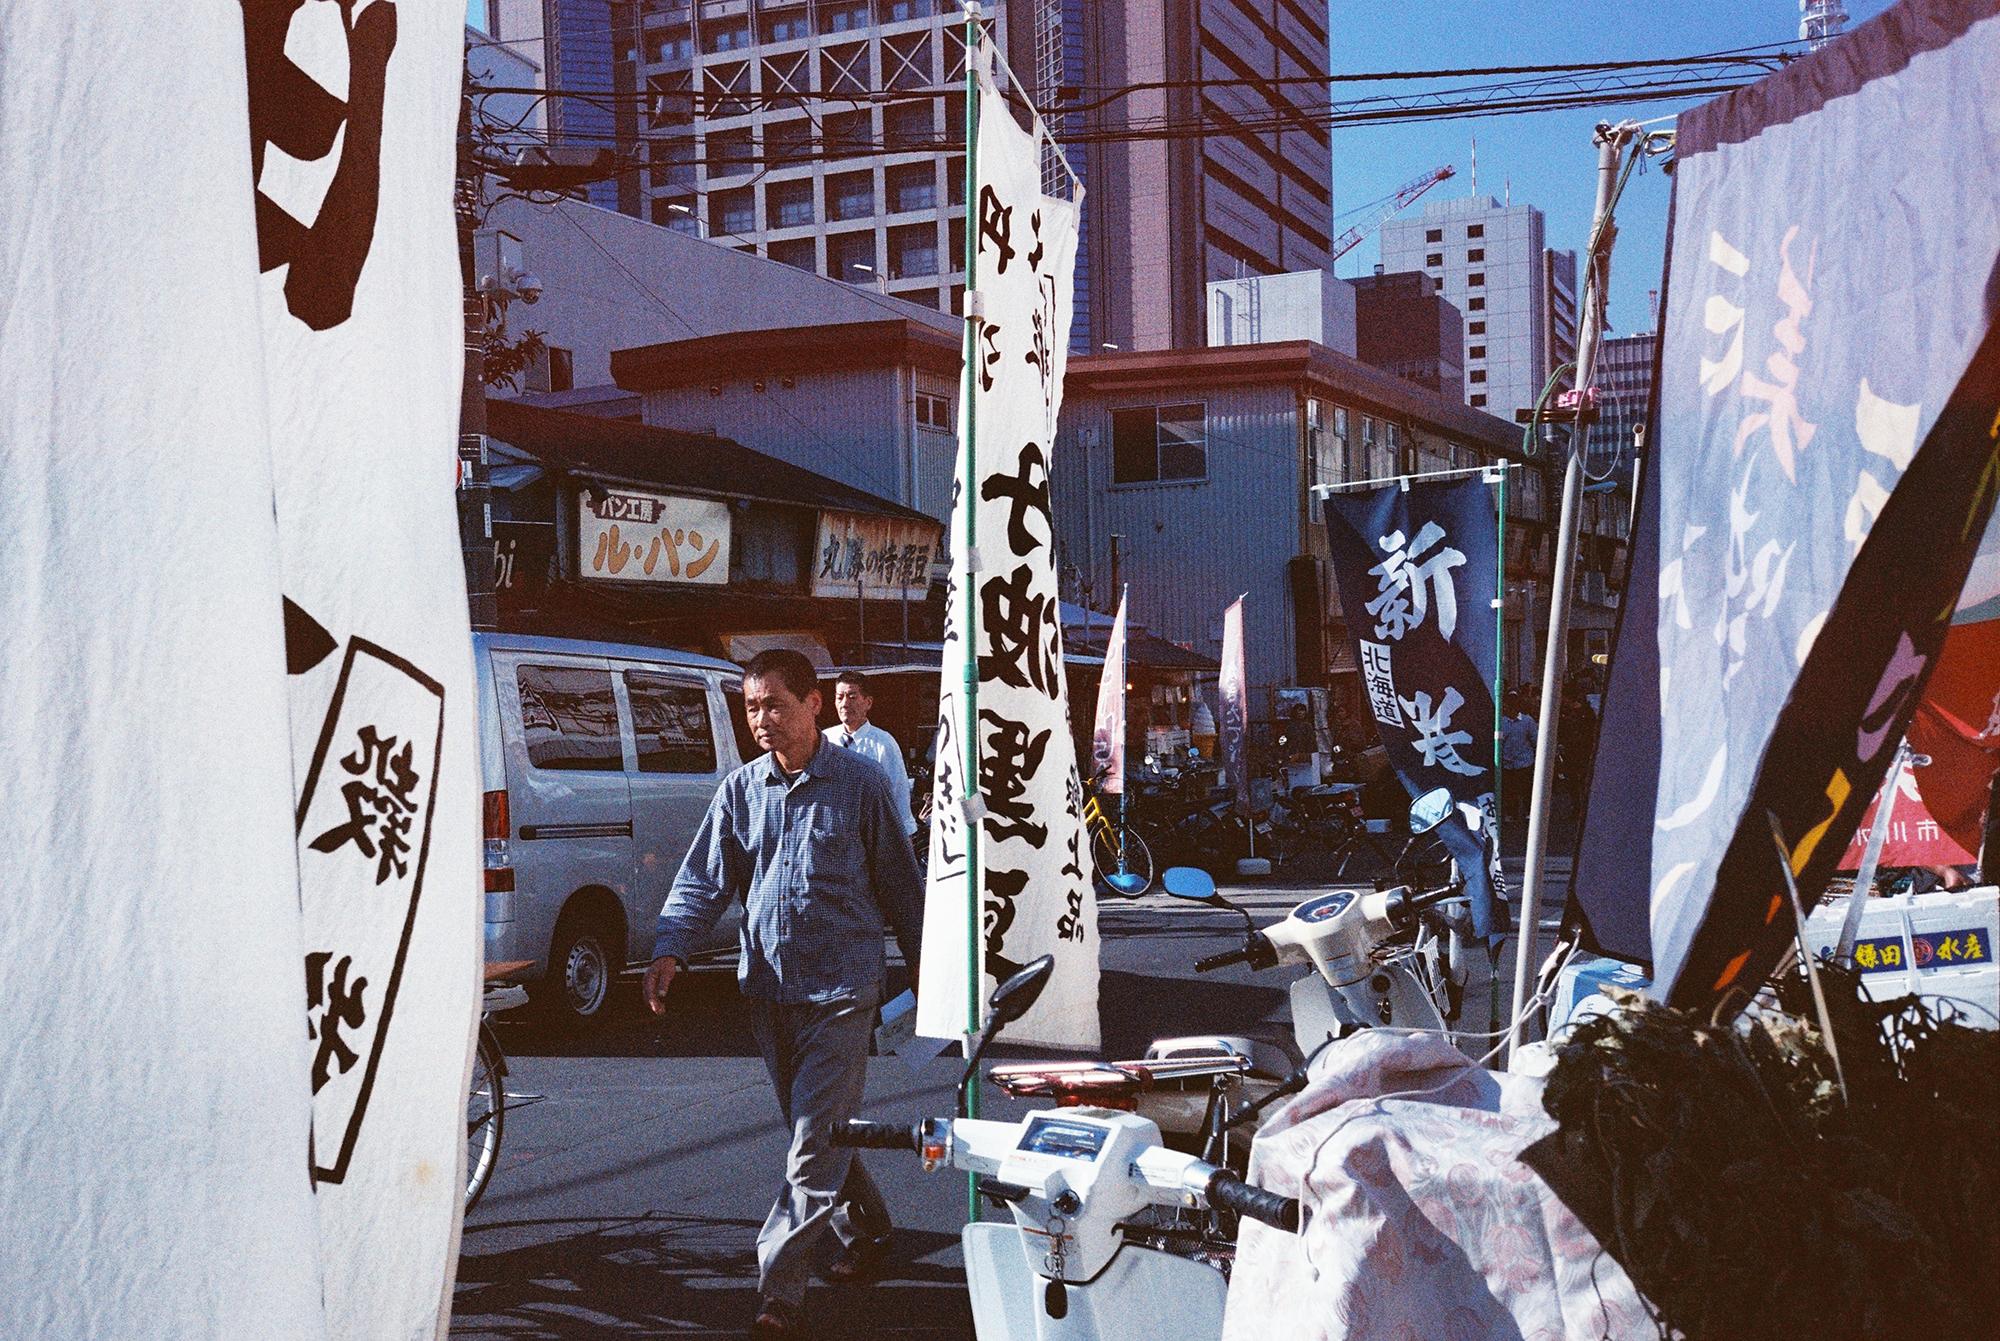 Walking-With-Flags-(Tsukiji-Market,-Tokyo)---000060.jpg